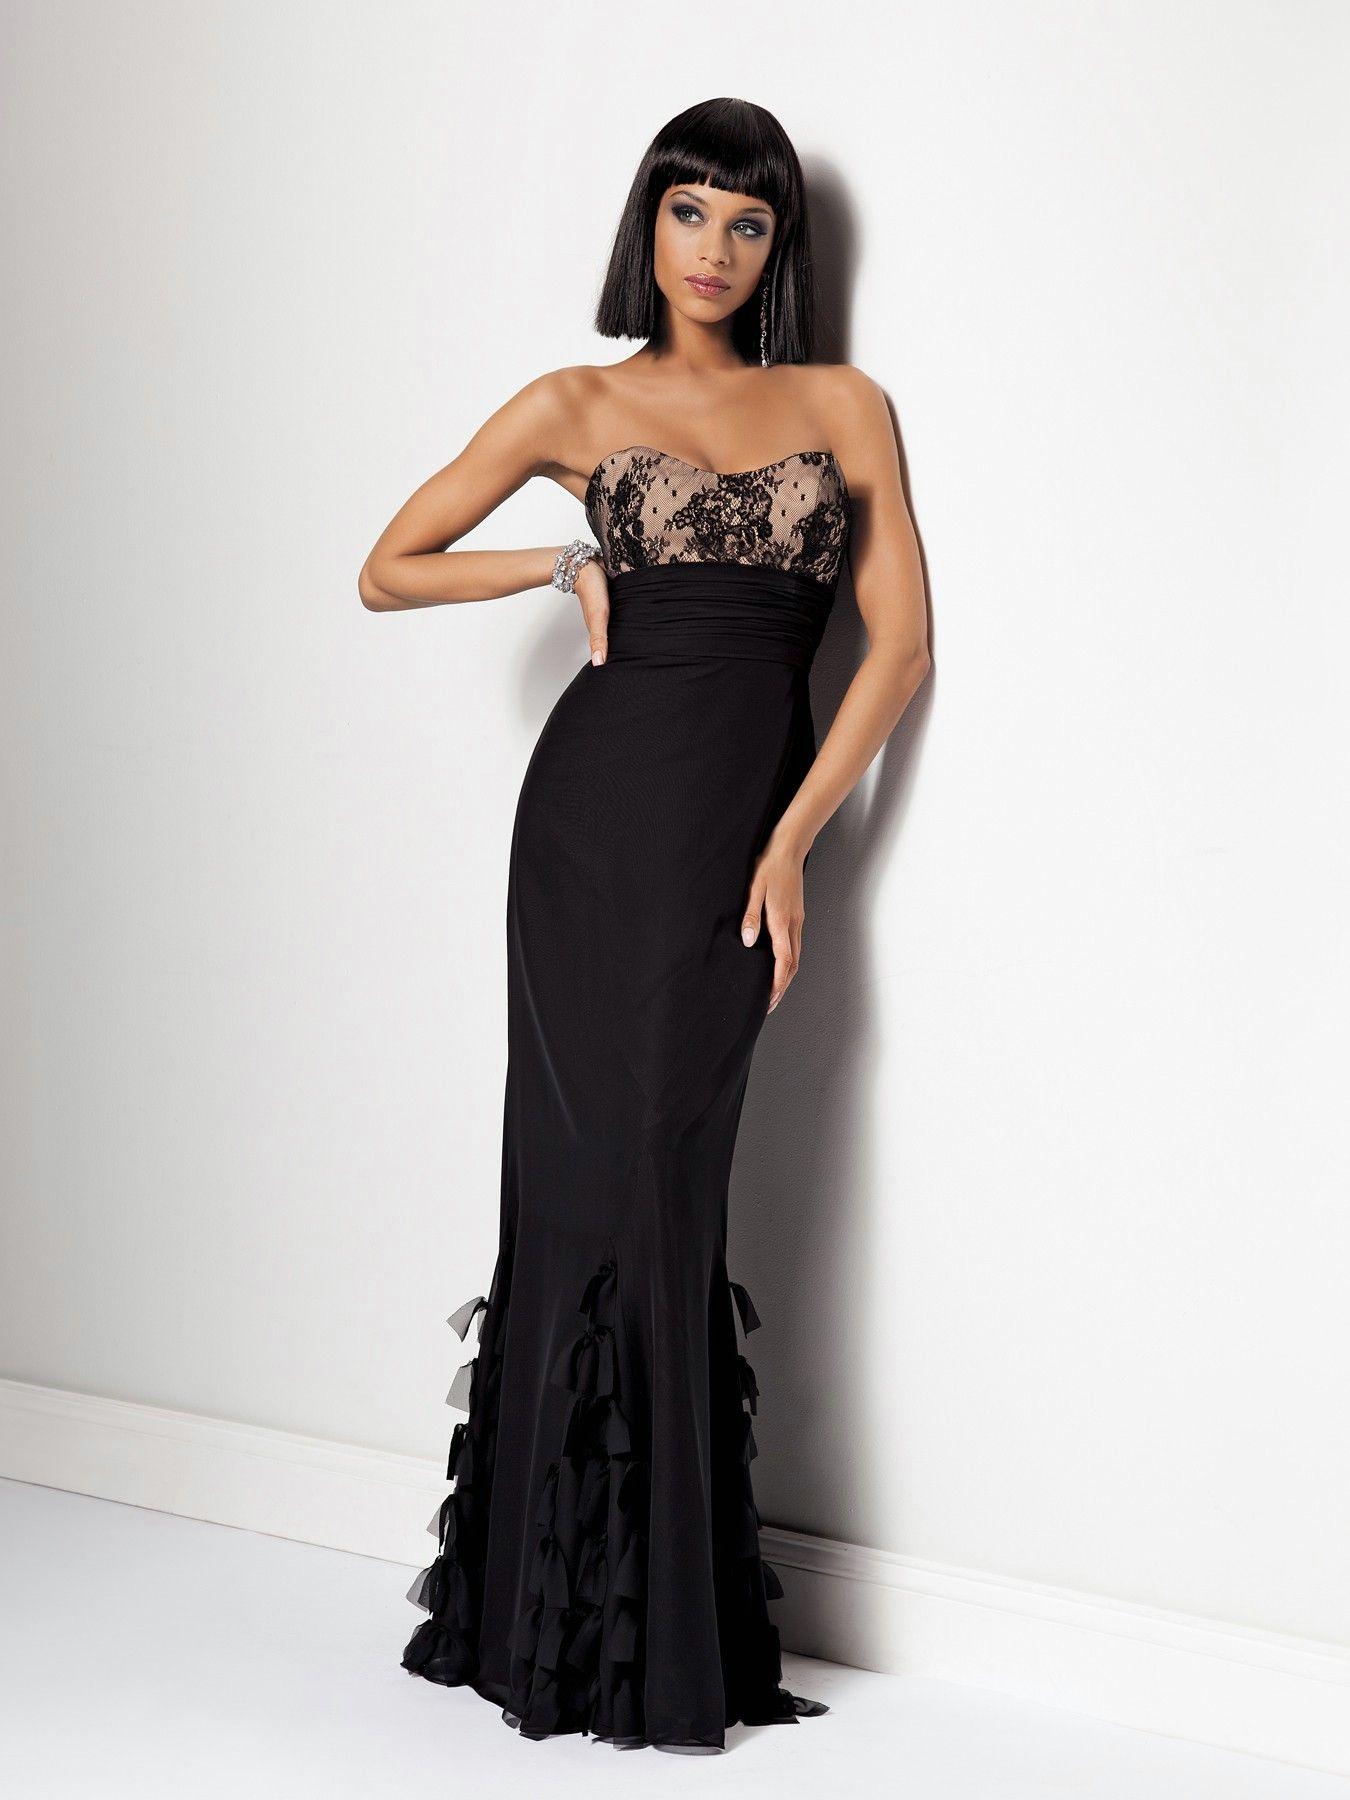 Jordan couture bridesmaid dresses style 1703 lace bridesmaid jordan couture bridesmaid dresses style 1703 lace bridesmaid dresses ombrellifo Gallery